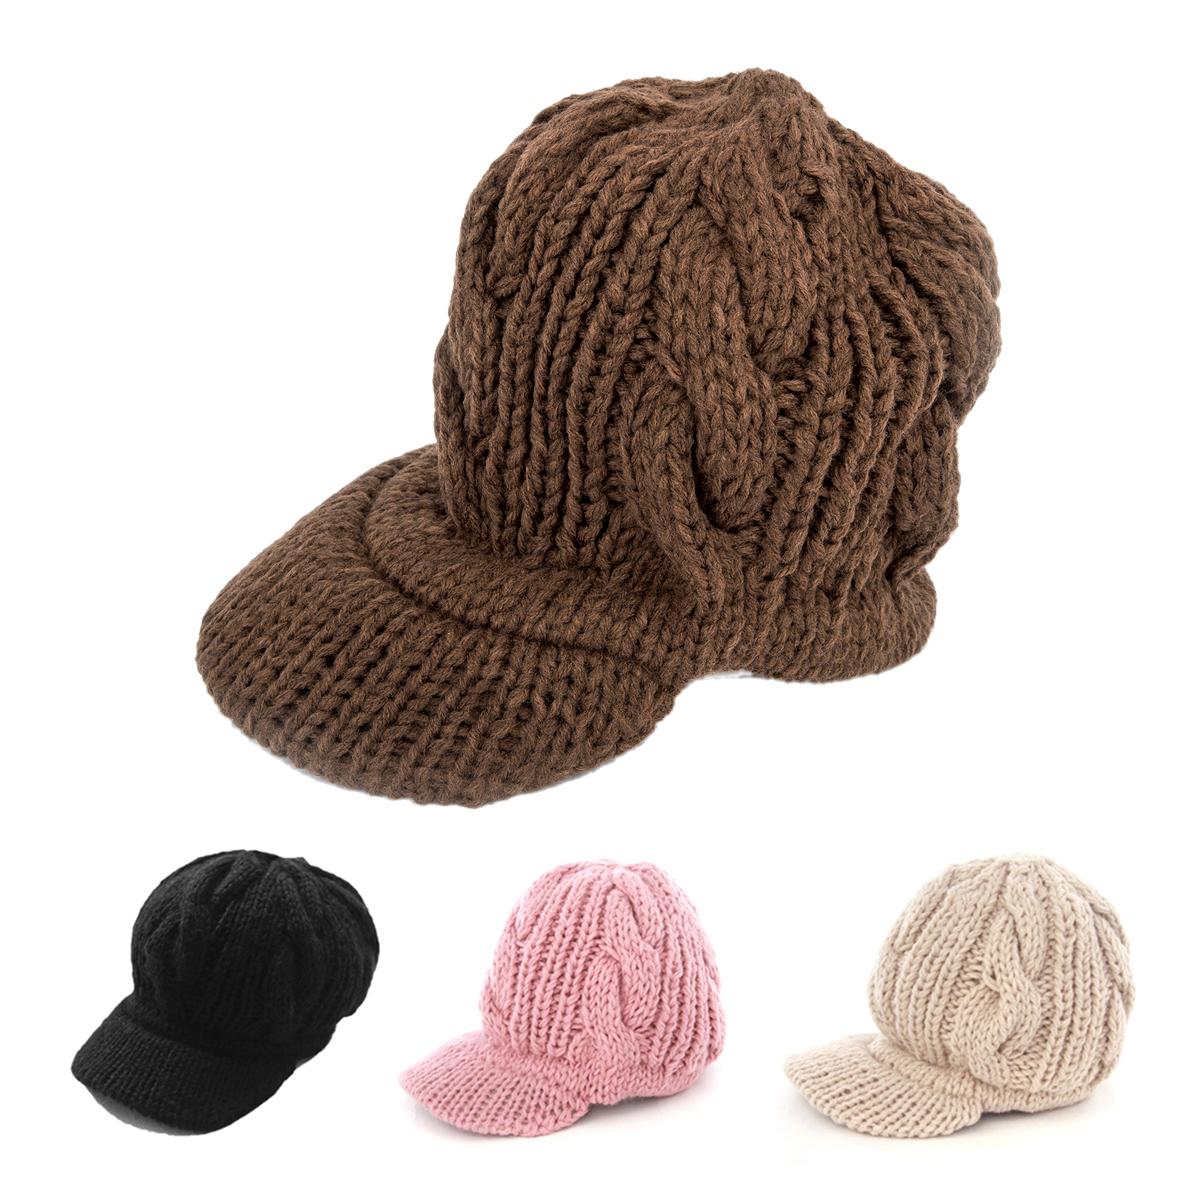 Women Slouchy Cabled Pattern Knit Beanie Crochet Rib Hat Warm - Black FK eBay